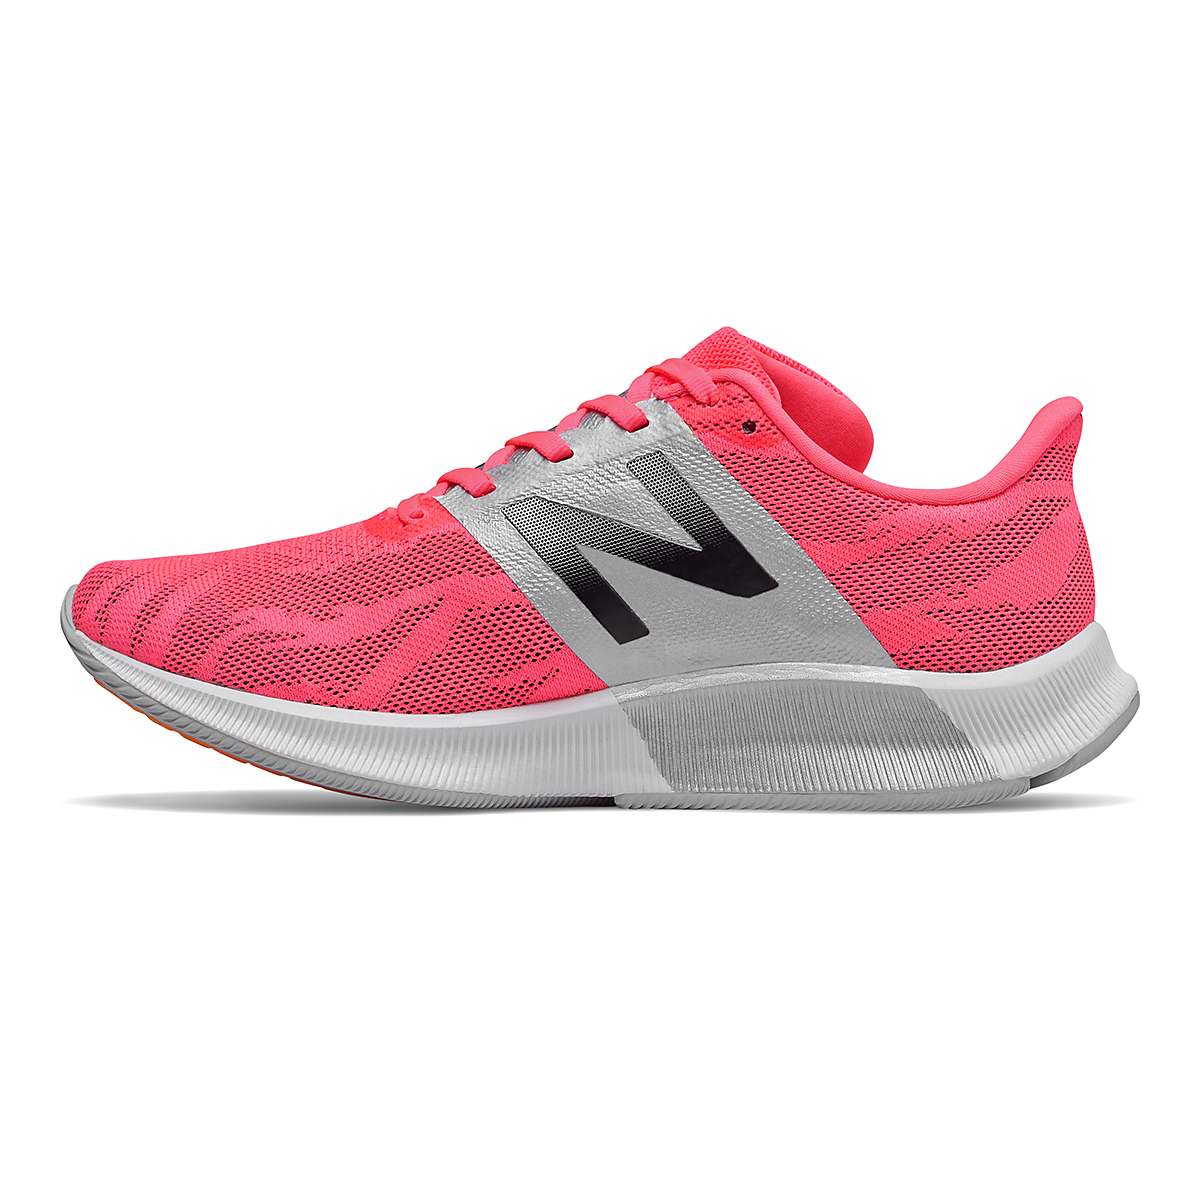 Women's New Balance 890V8 Running Shoe - Color: Guava - Size: 7 - Width: Regular, Guava, large, image 2